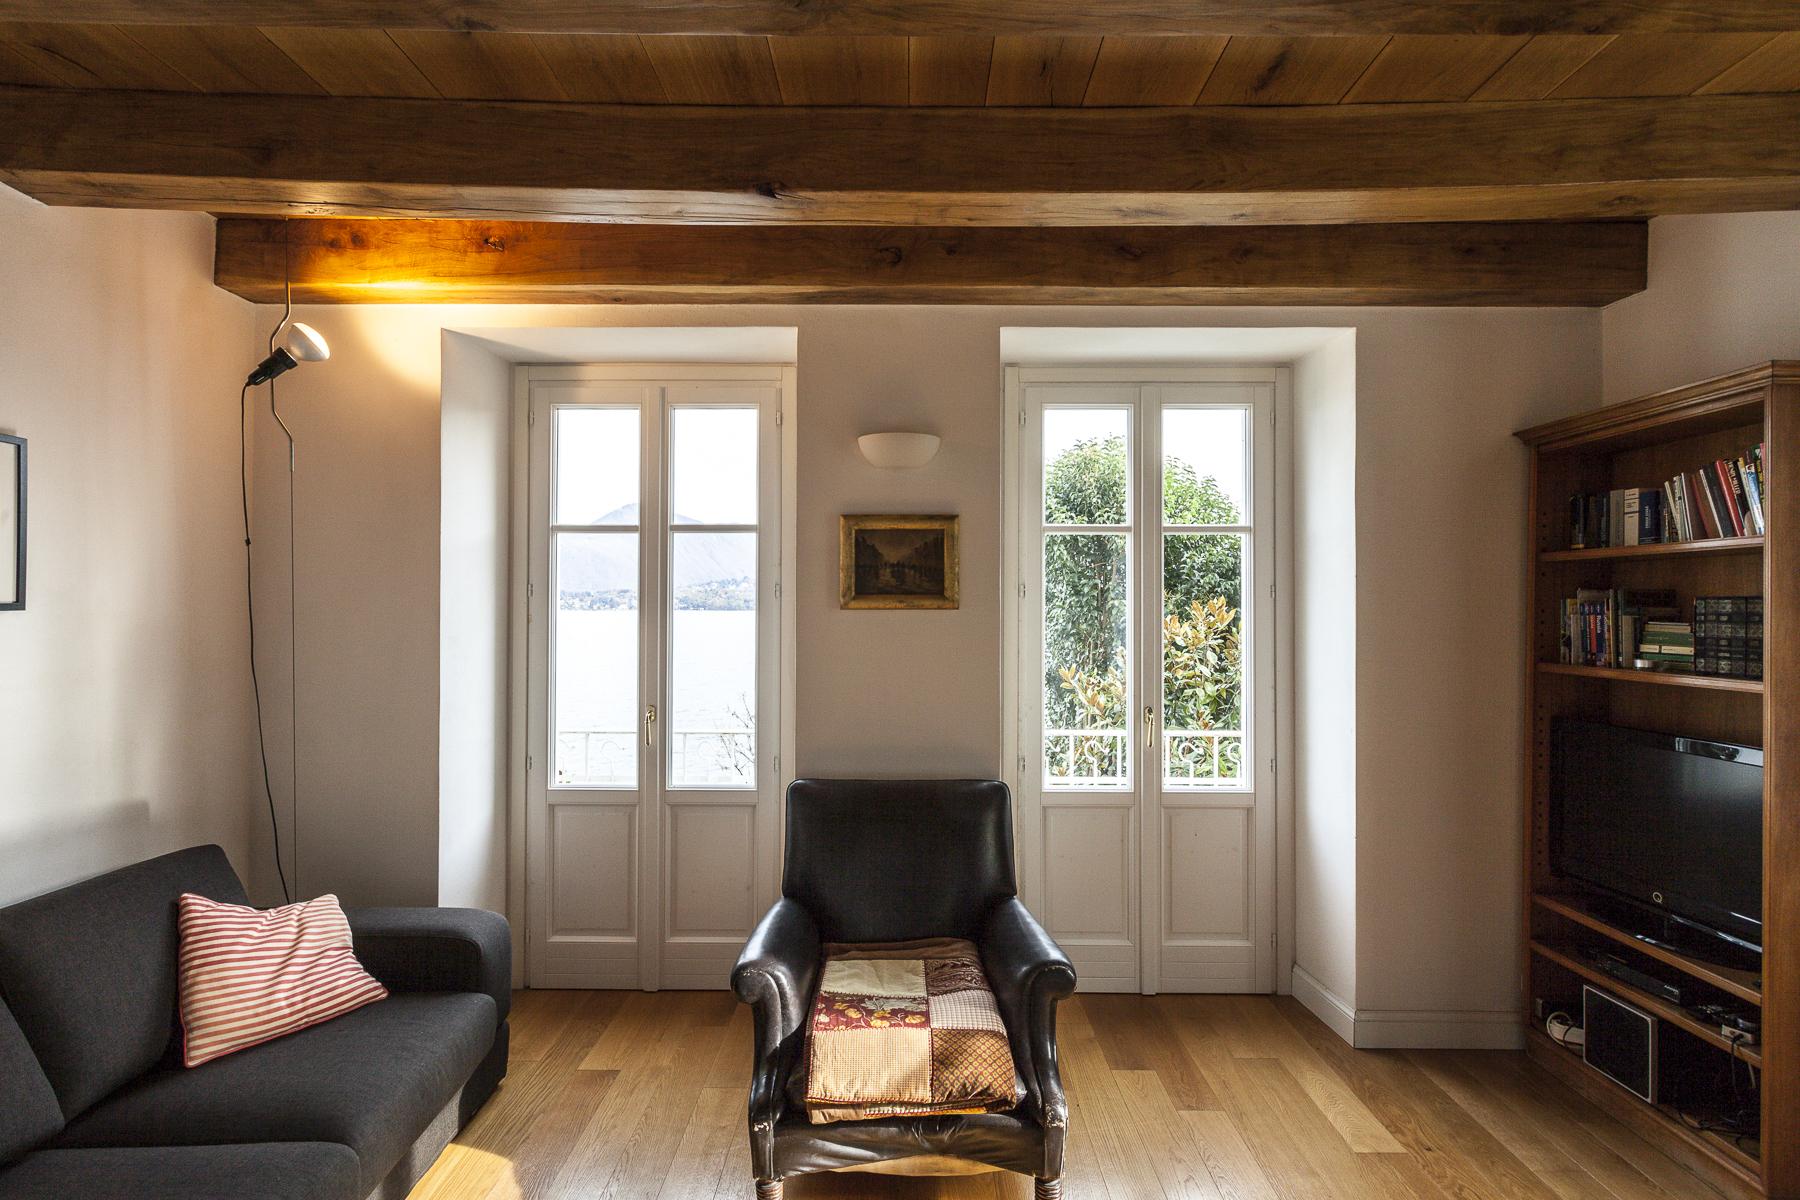 Villa in Vendita a Stresa: 5 locali, 360 mq - Foto 4